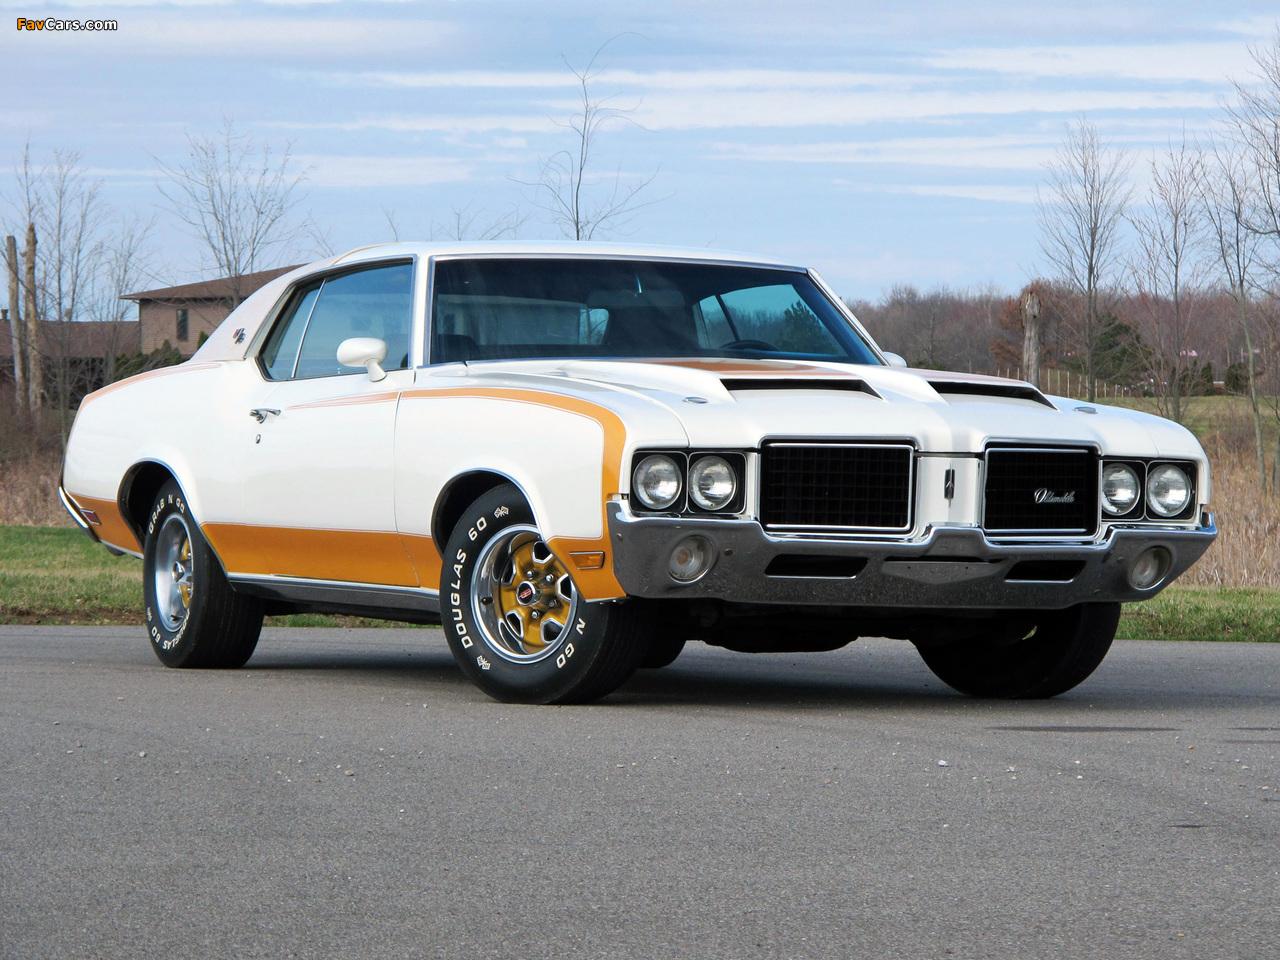 Hurst/Olds Cutlass Supreme Hardtop Coupe Indy 500 Pace Car 1972 photos (1280 x 960)